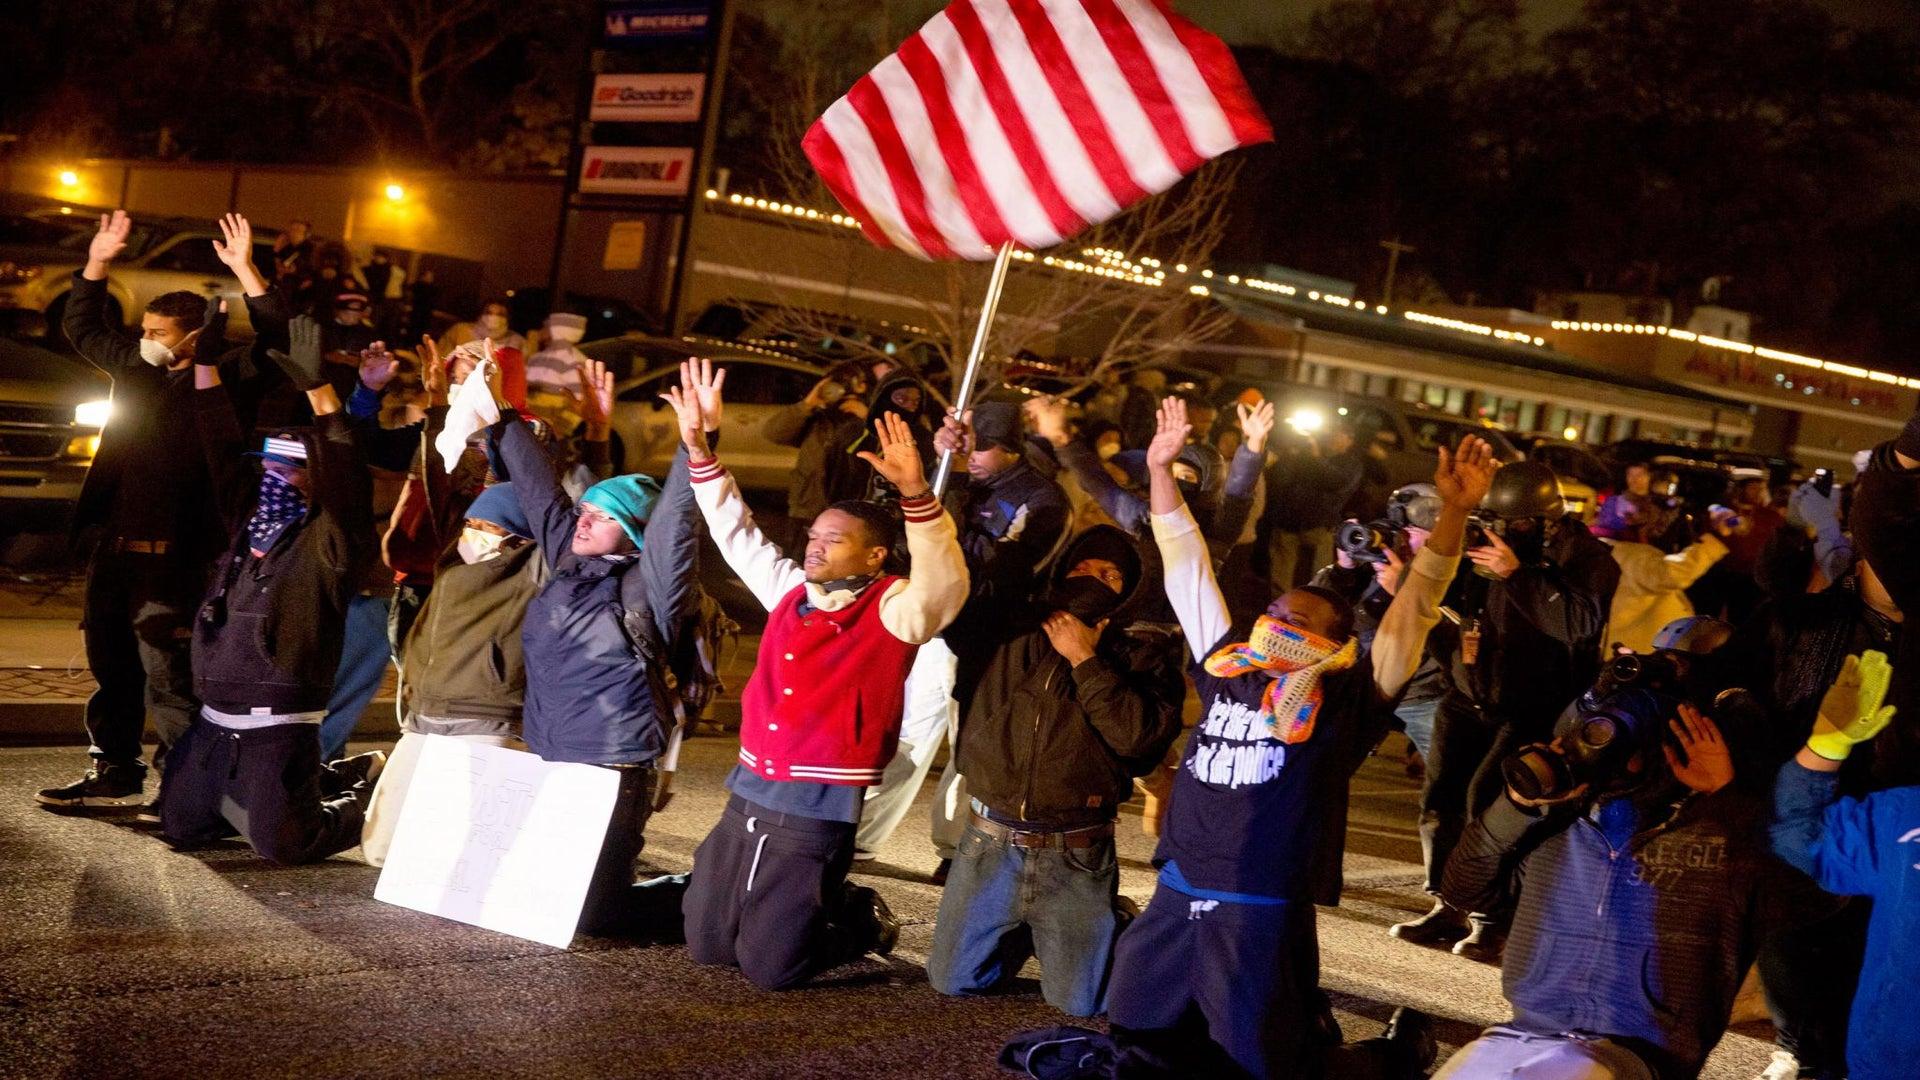 A Heartbroken Ferguson Activist Says 'Our Community is Traumatized'